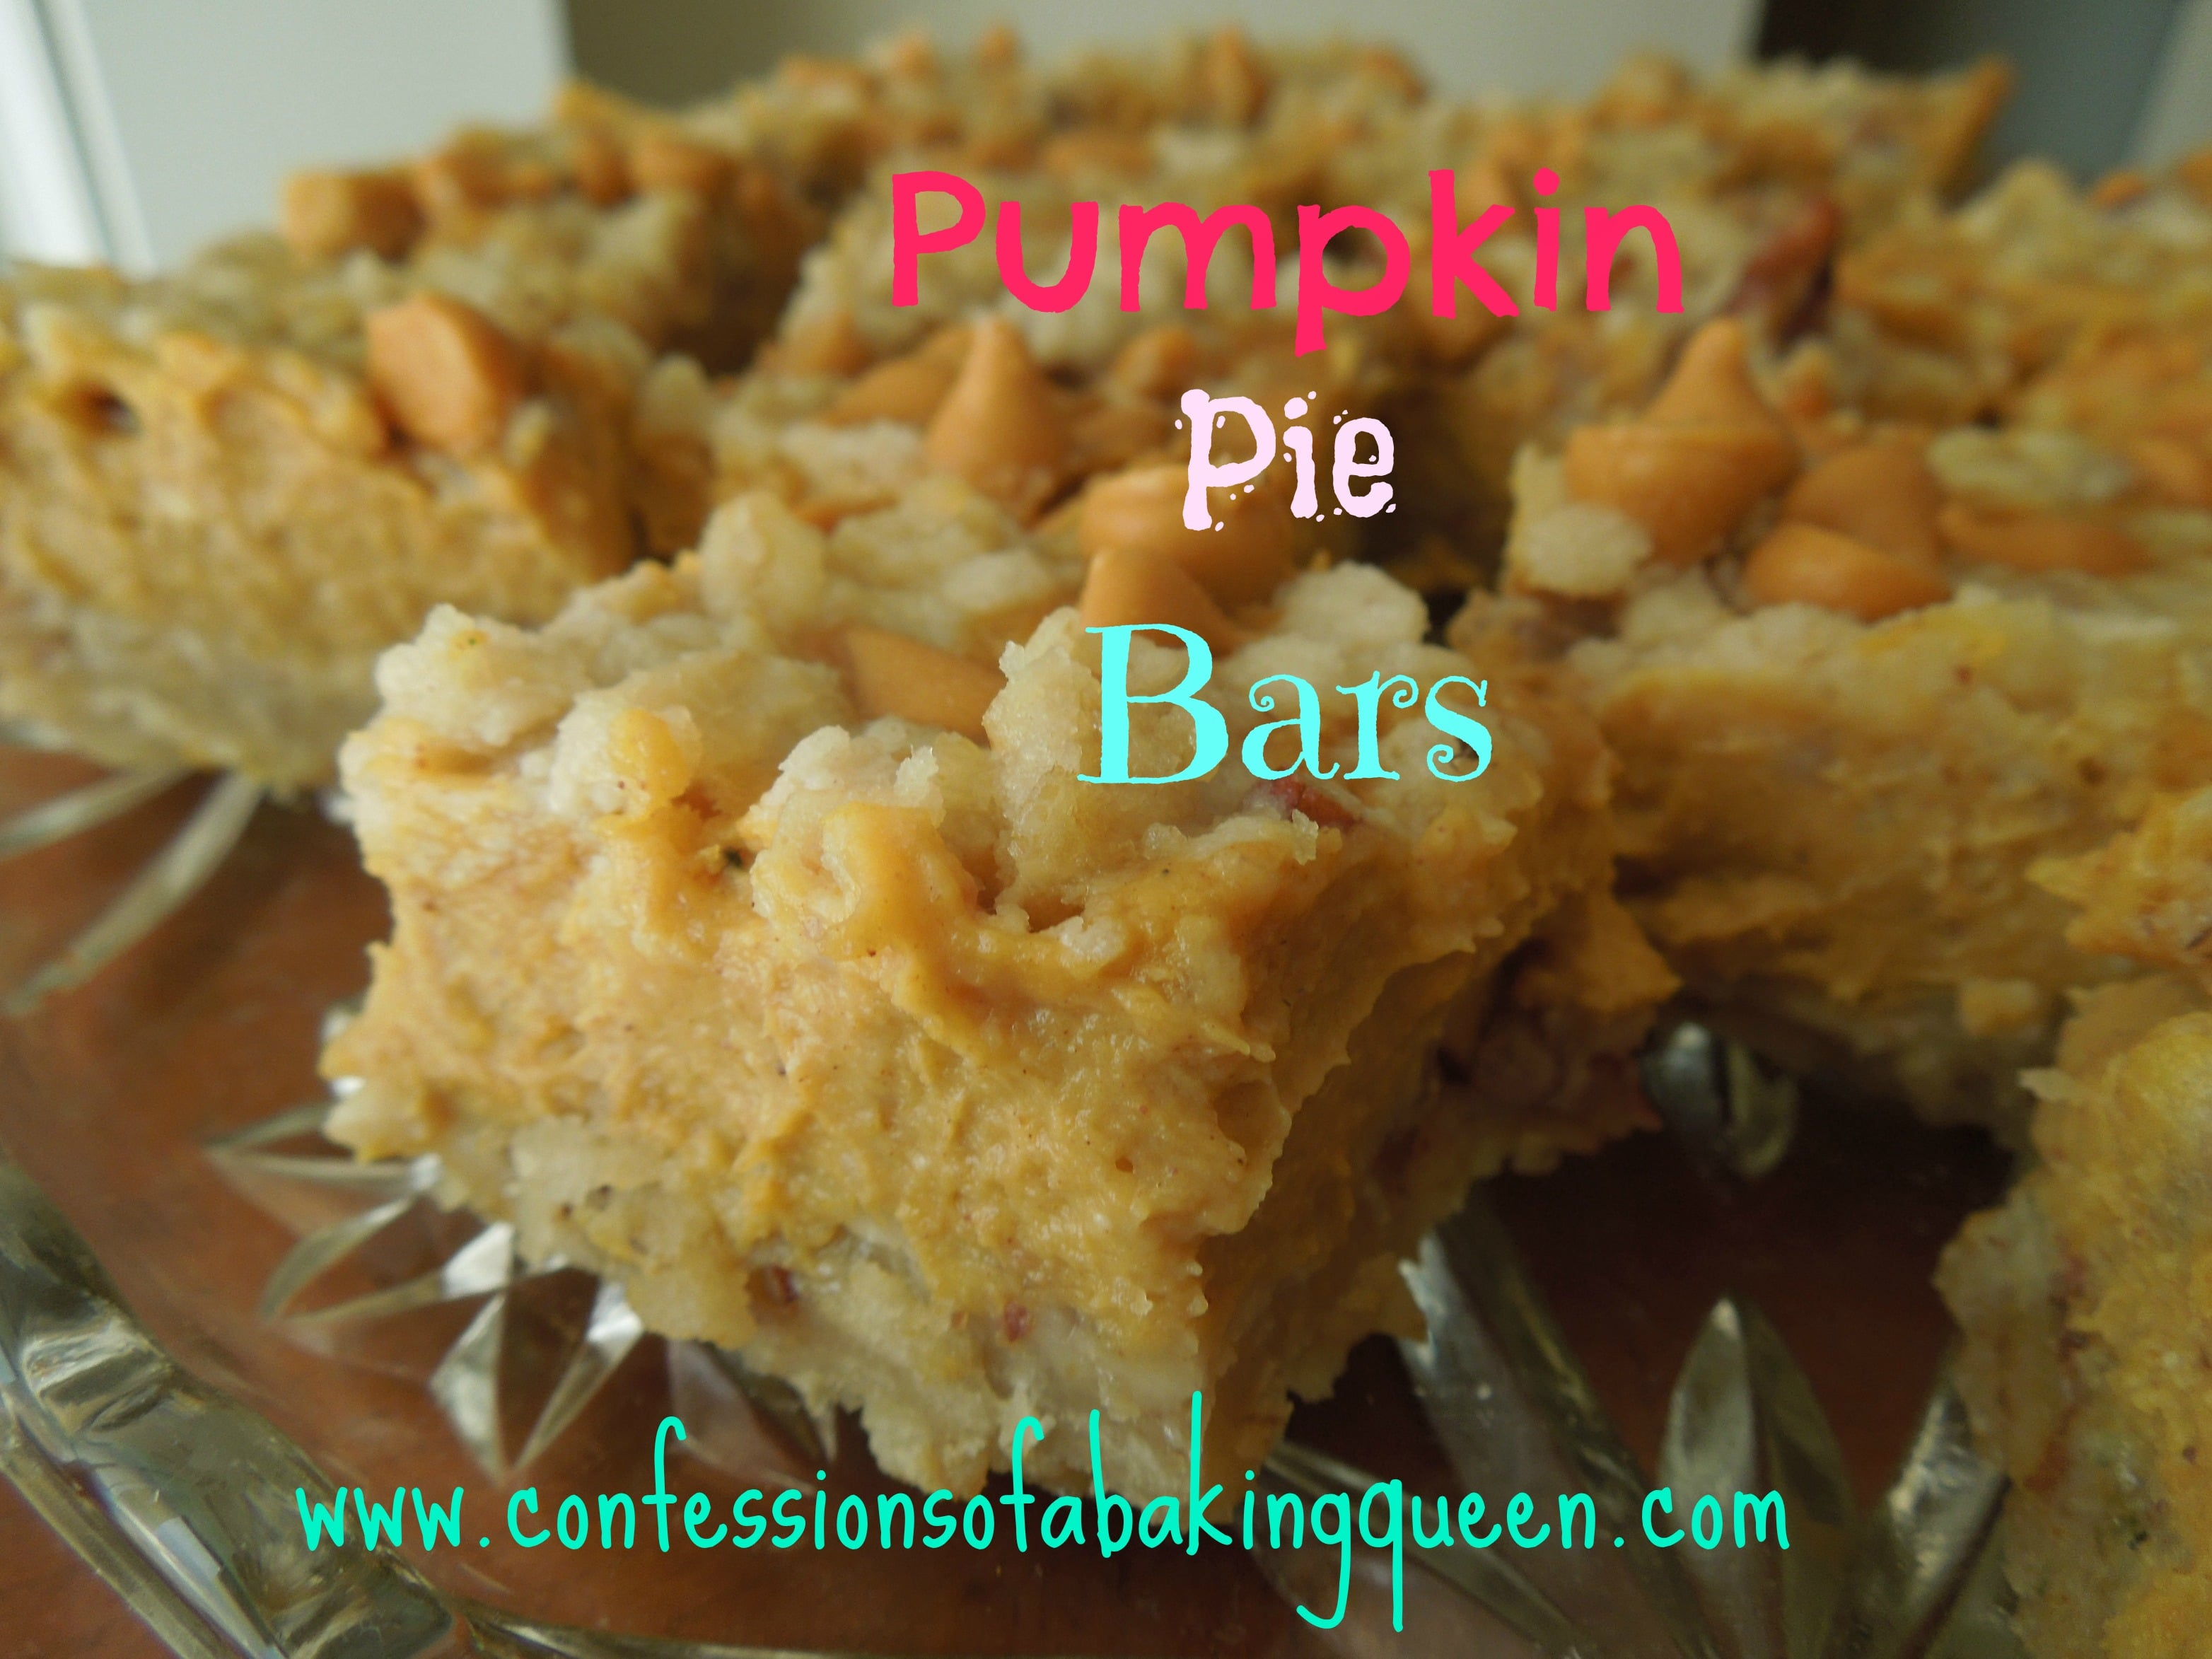 Pumpkin Pie Bars www.confessionsofabakingqueen.com